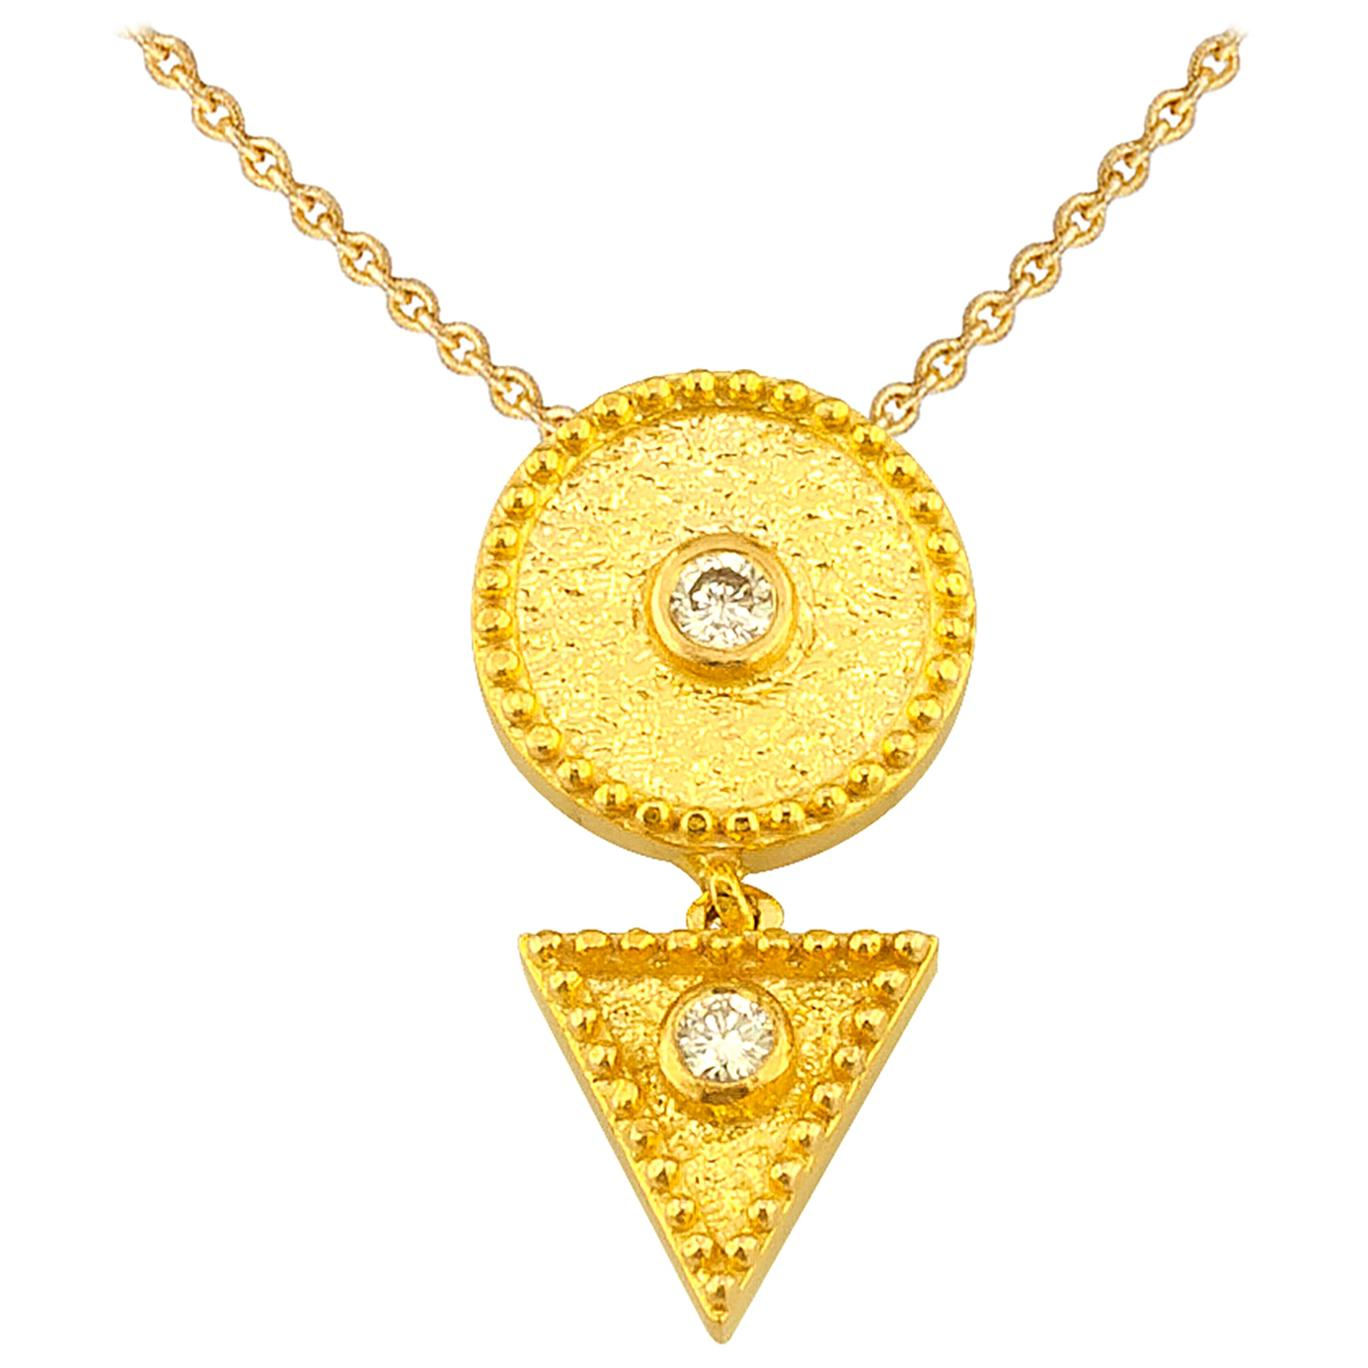 Georgios Collections 18 Karat Yellow Gold Diamond Geometric Pendant Necklace